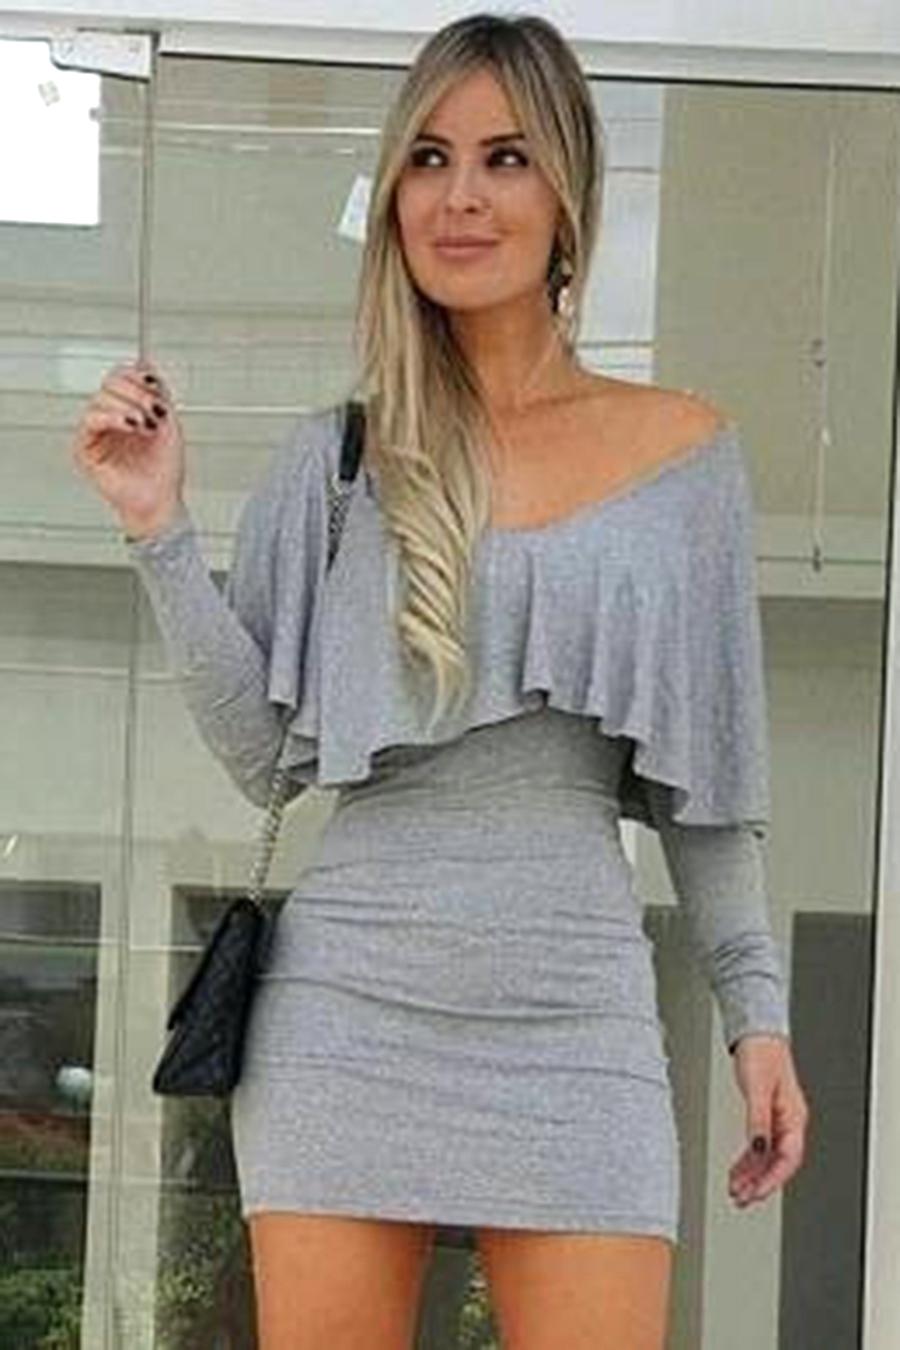 Vestido Curto Viscolycra Decotado Manga Longa Babado Cinza